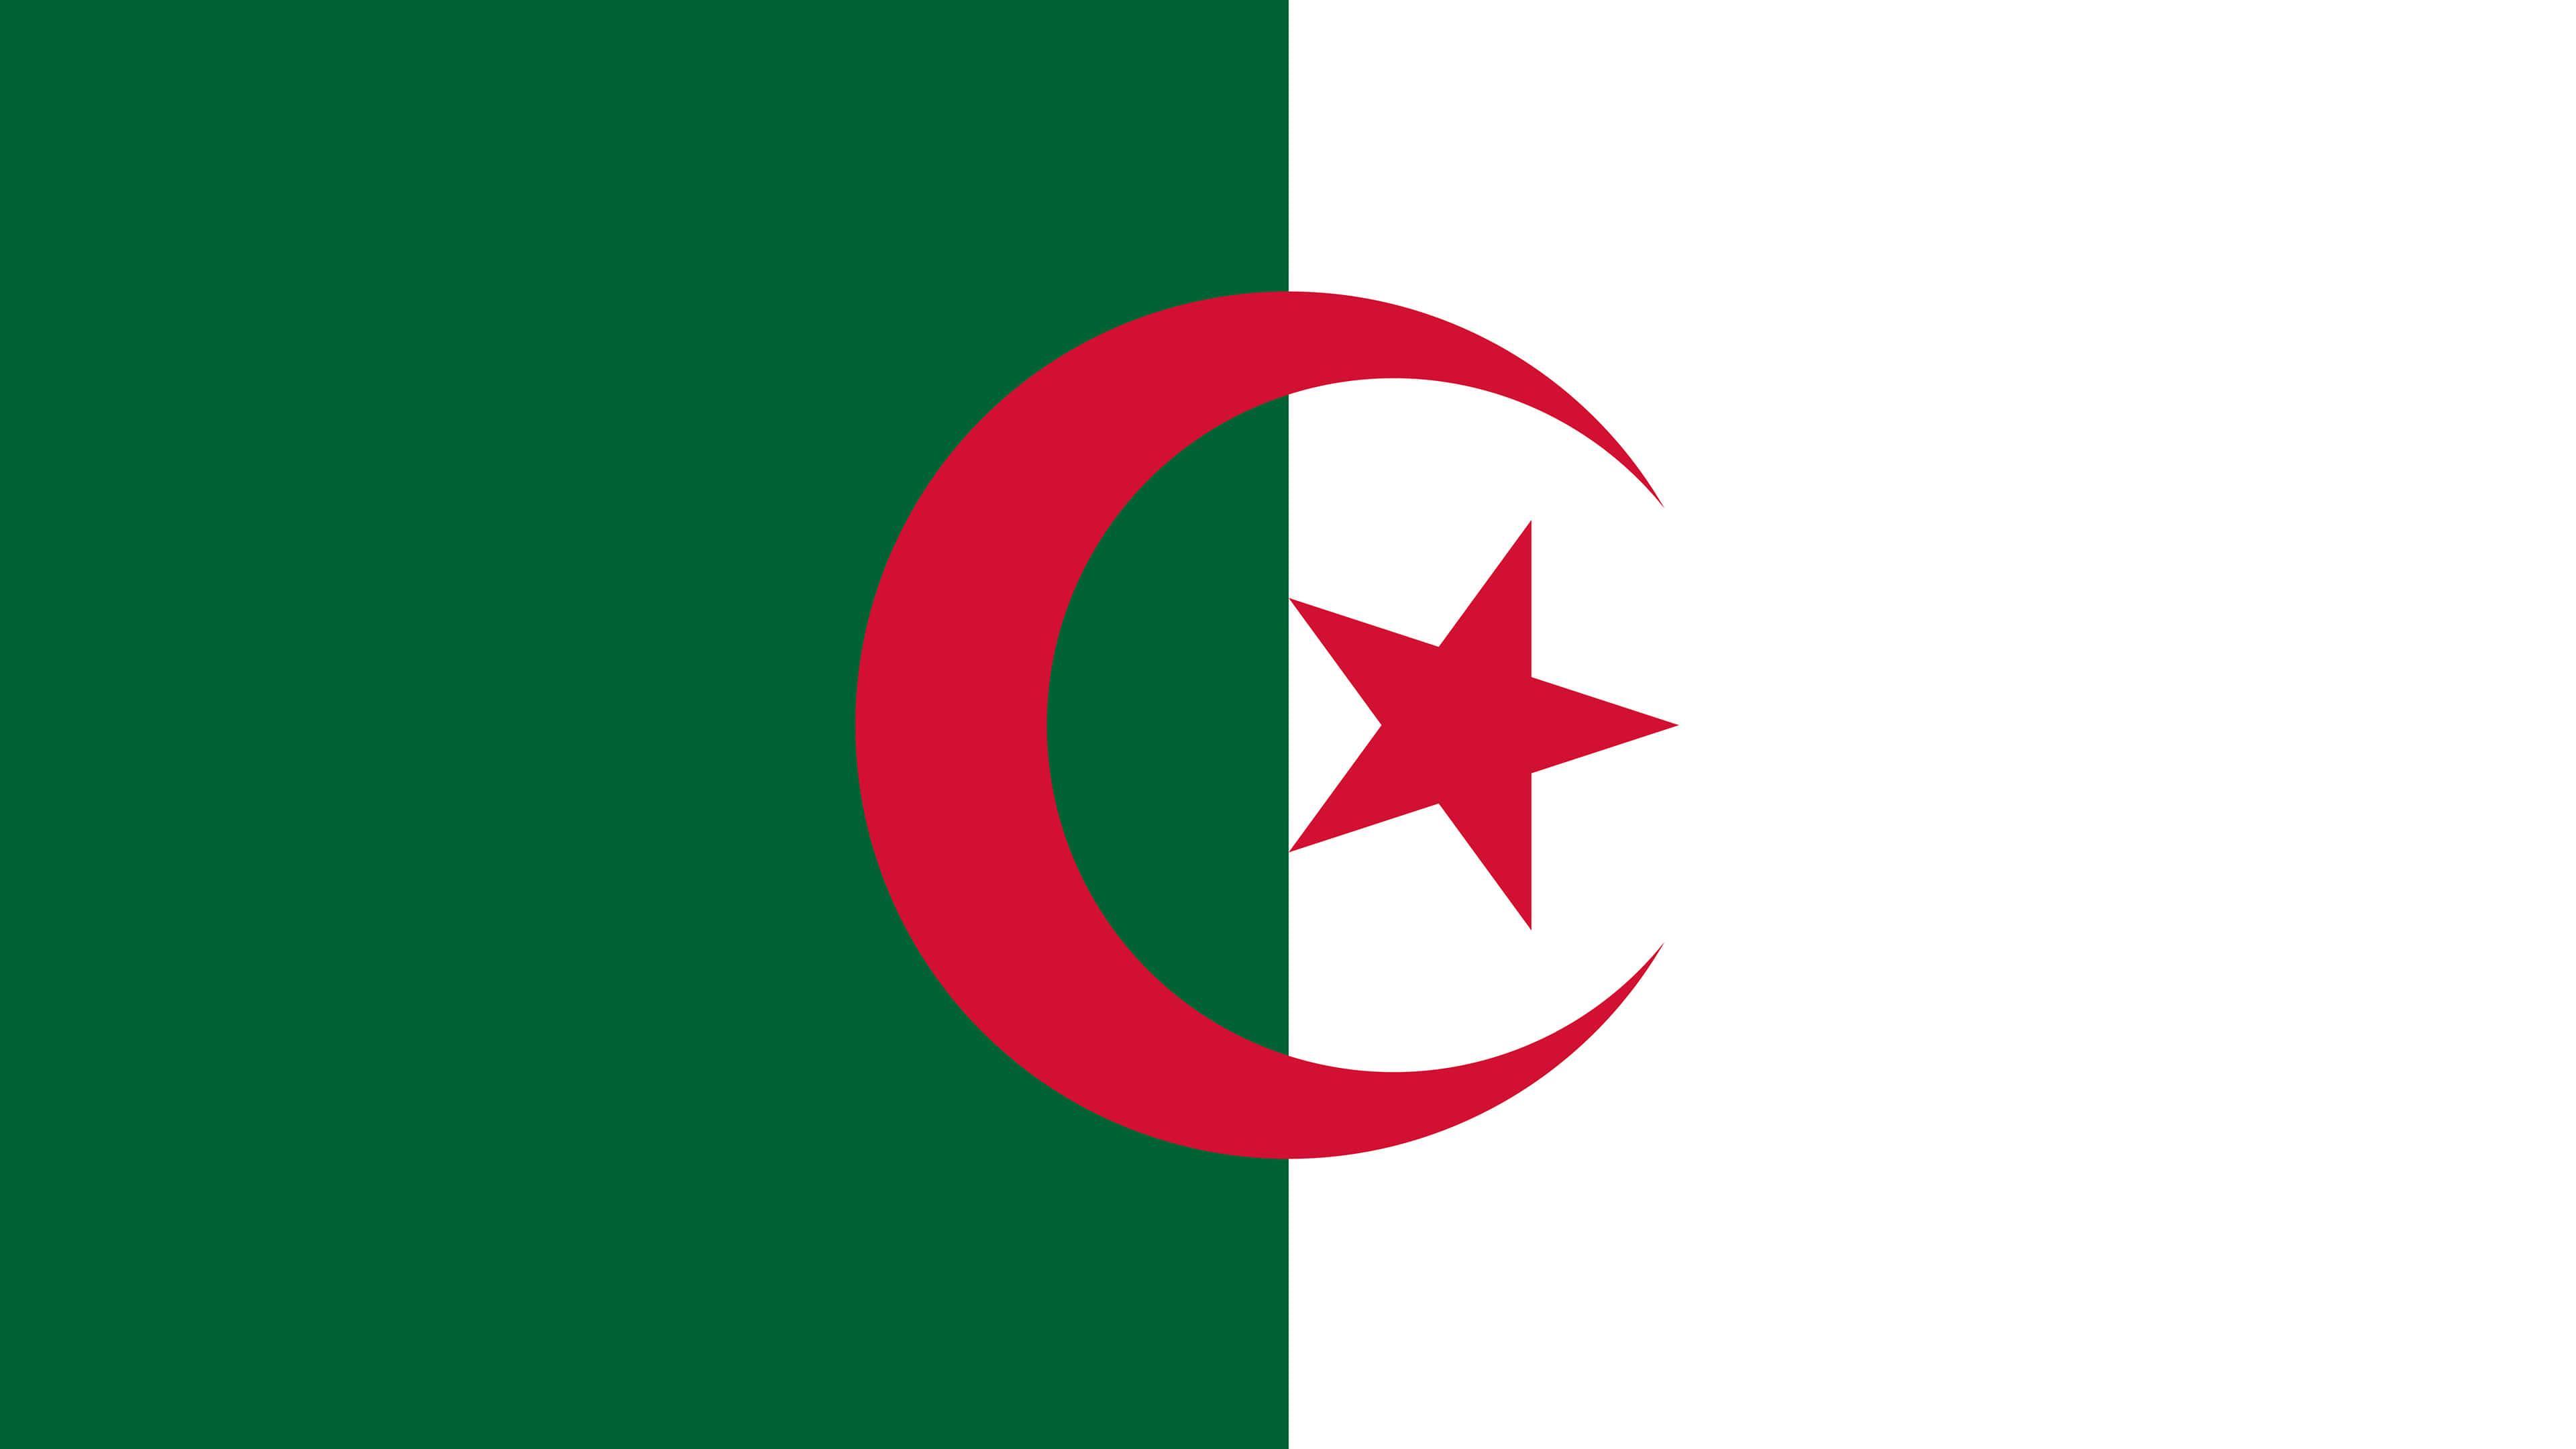 Algeria Flag UHD 4K Wallpaper Pixelz 3840x2160